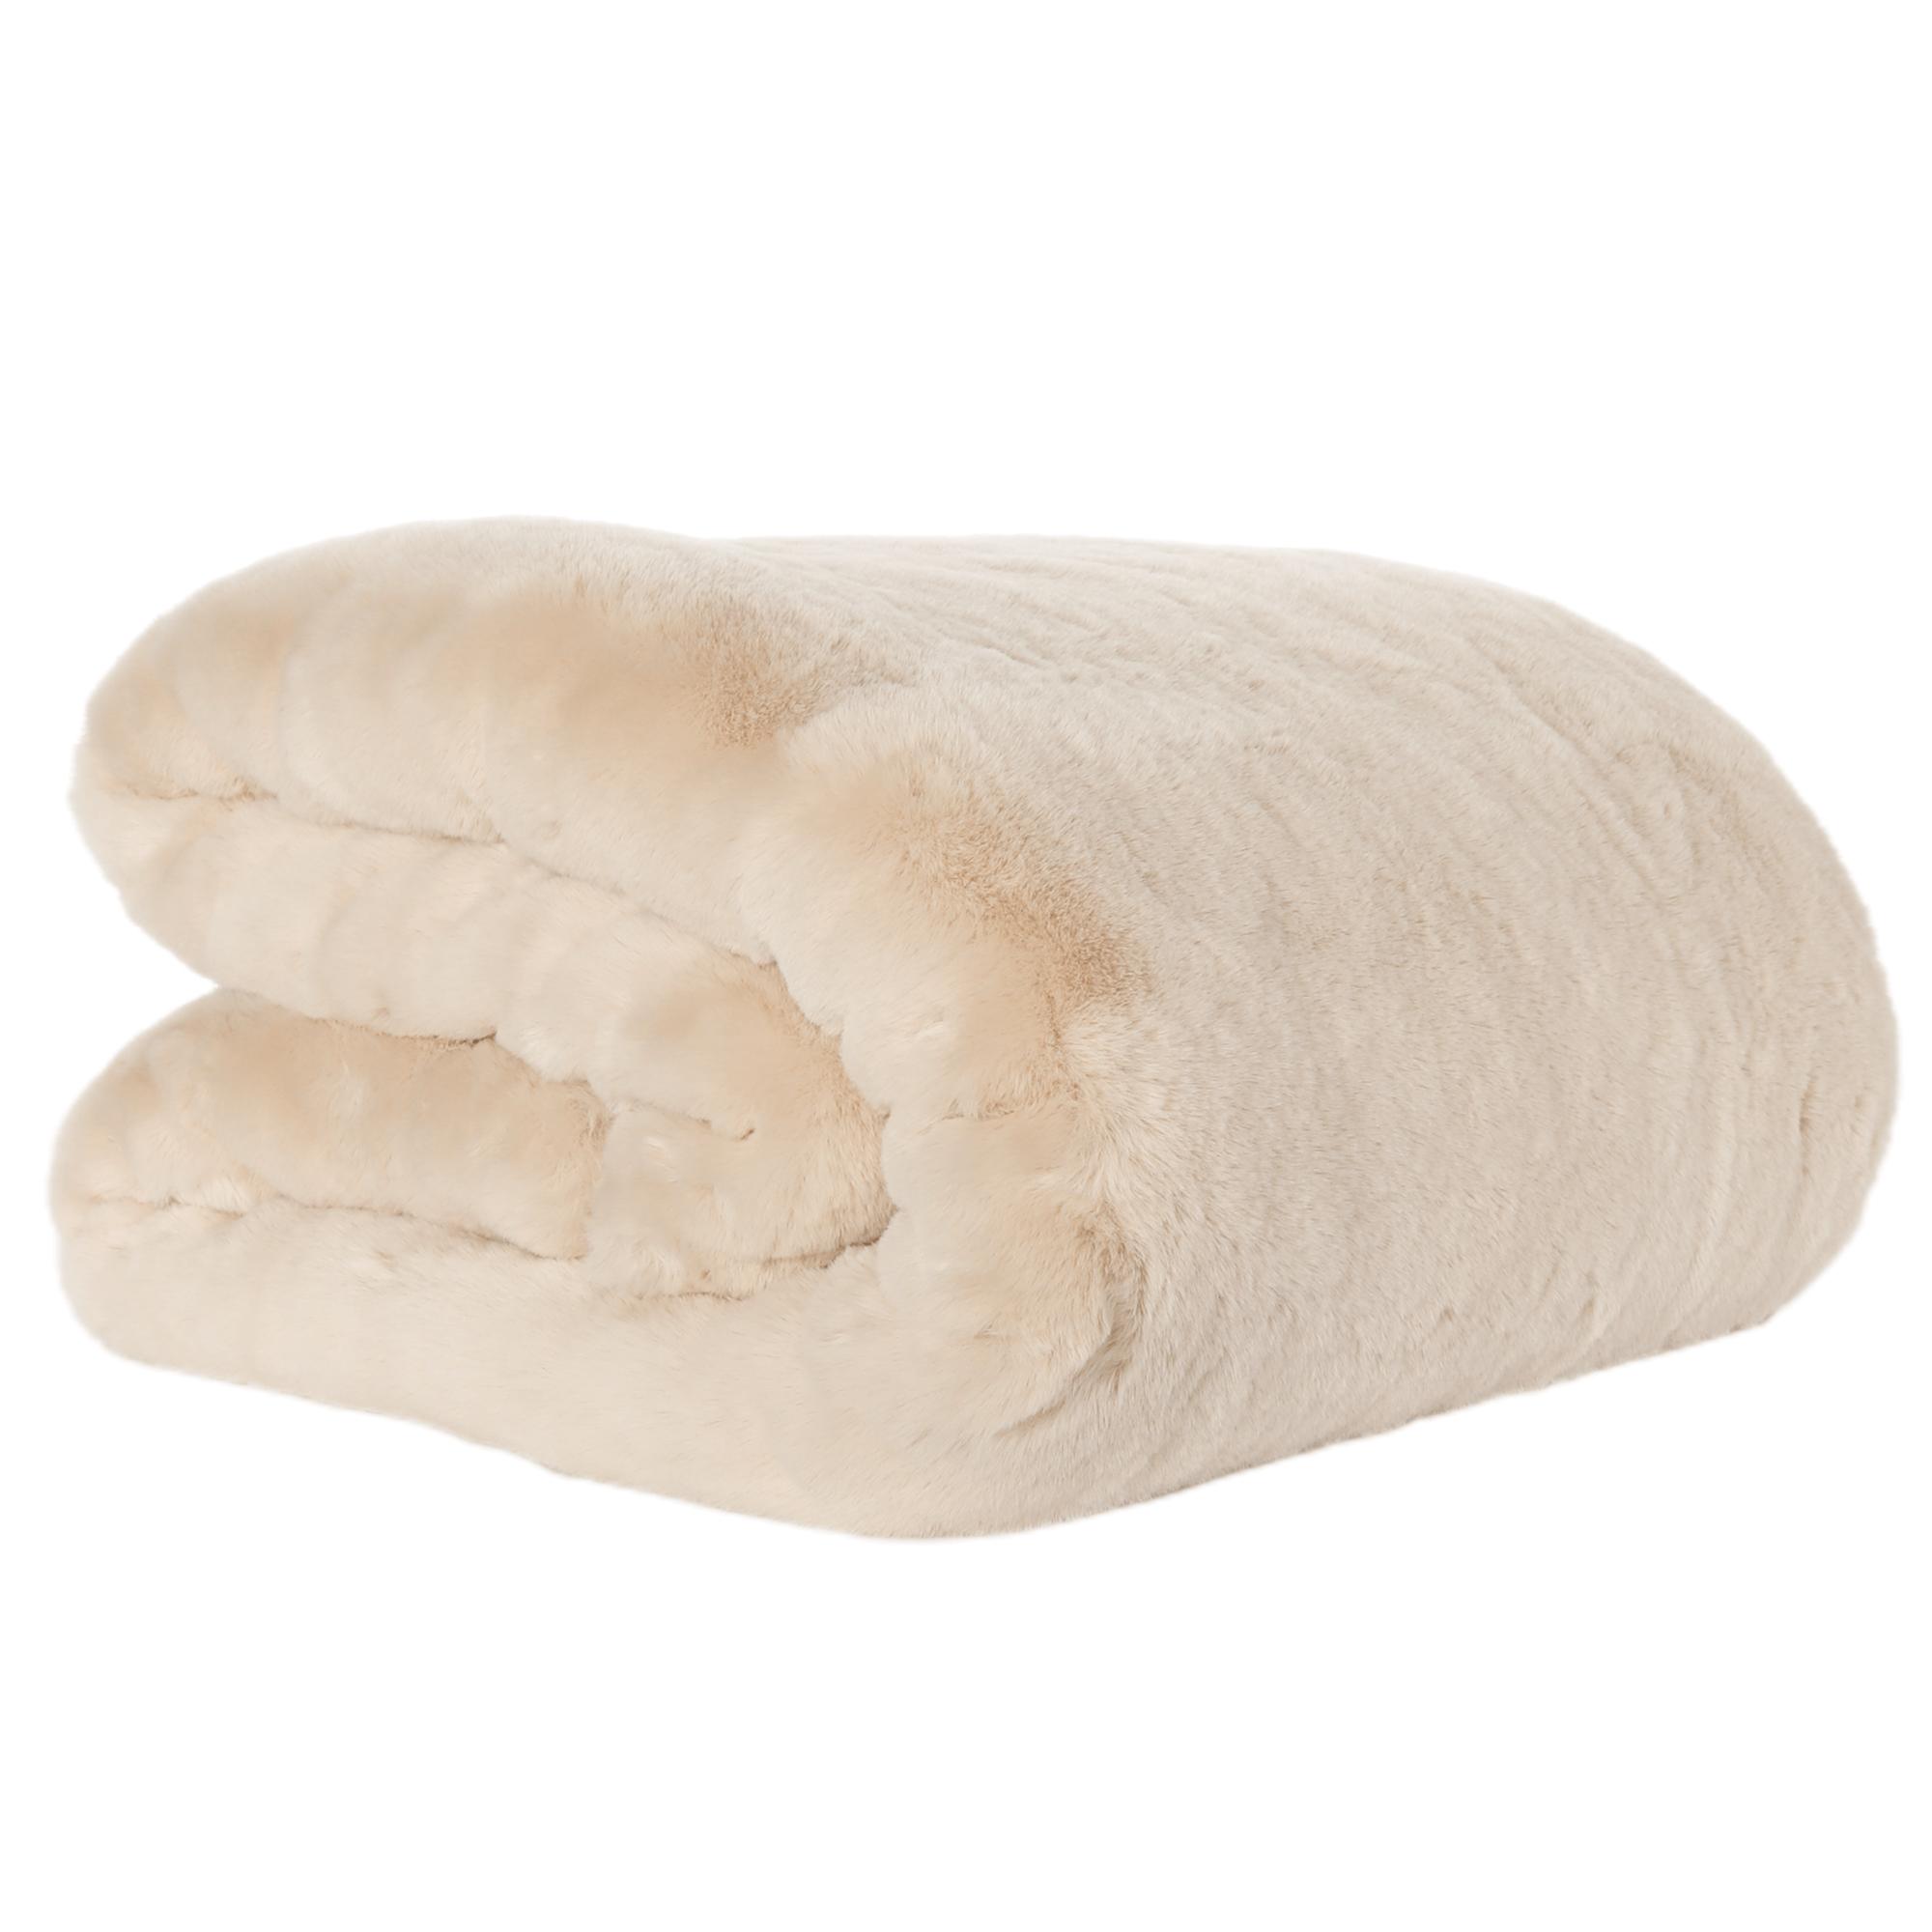 Kožušinová deka, béžová, 150x180, RABITA NEW TYP 2